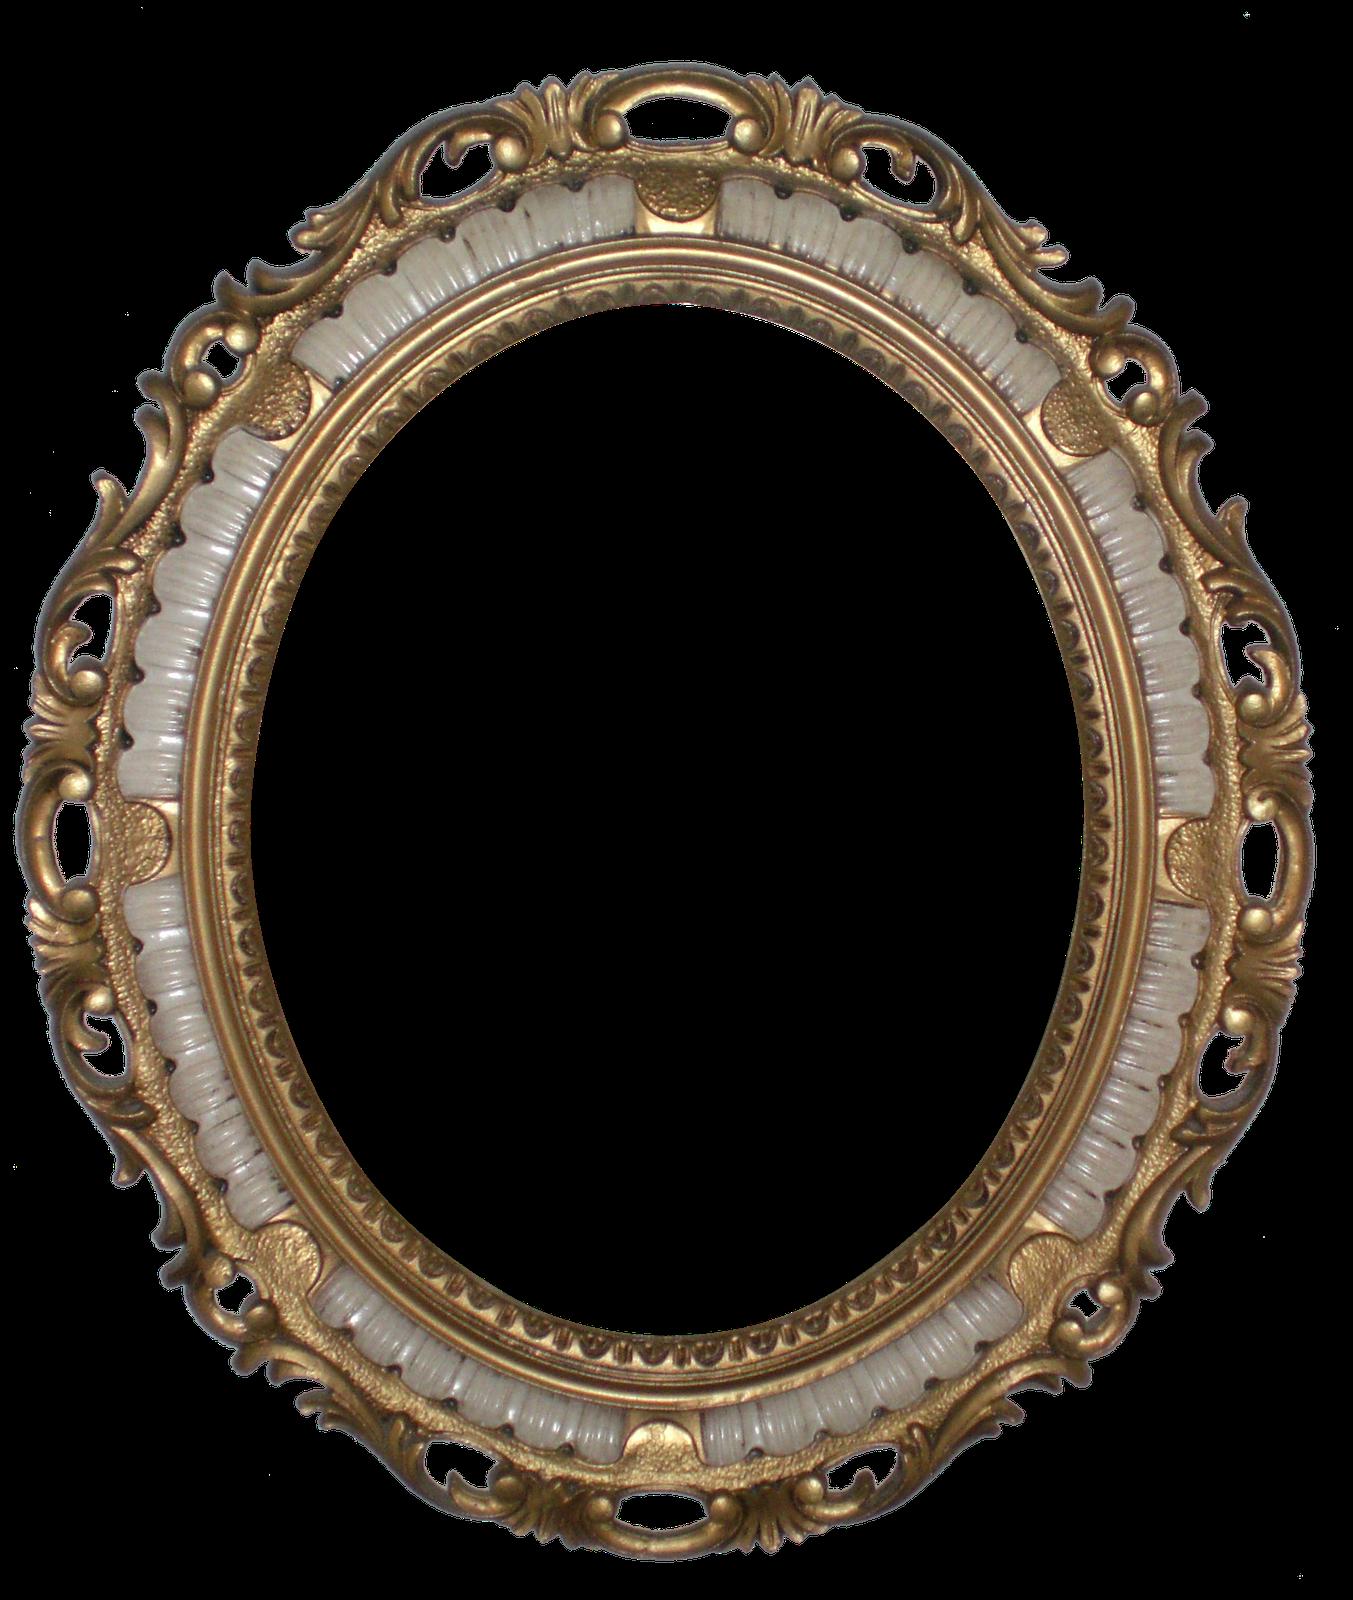 png Mirror transparent. Png image purepng free